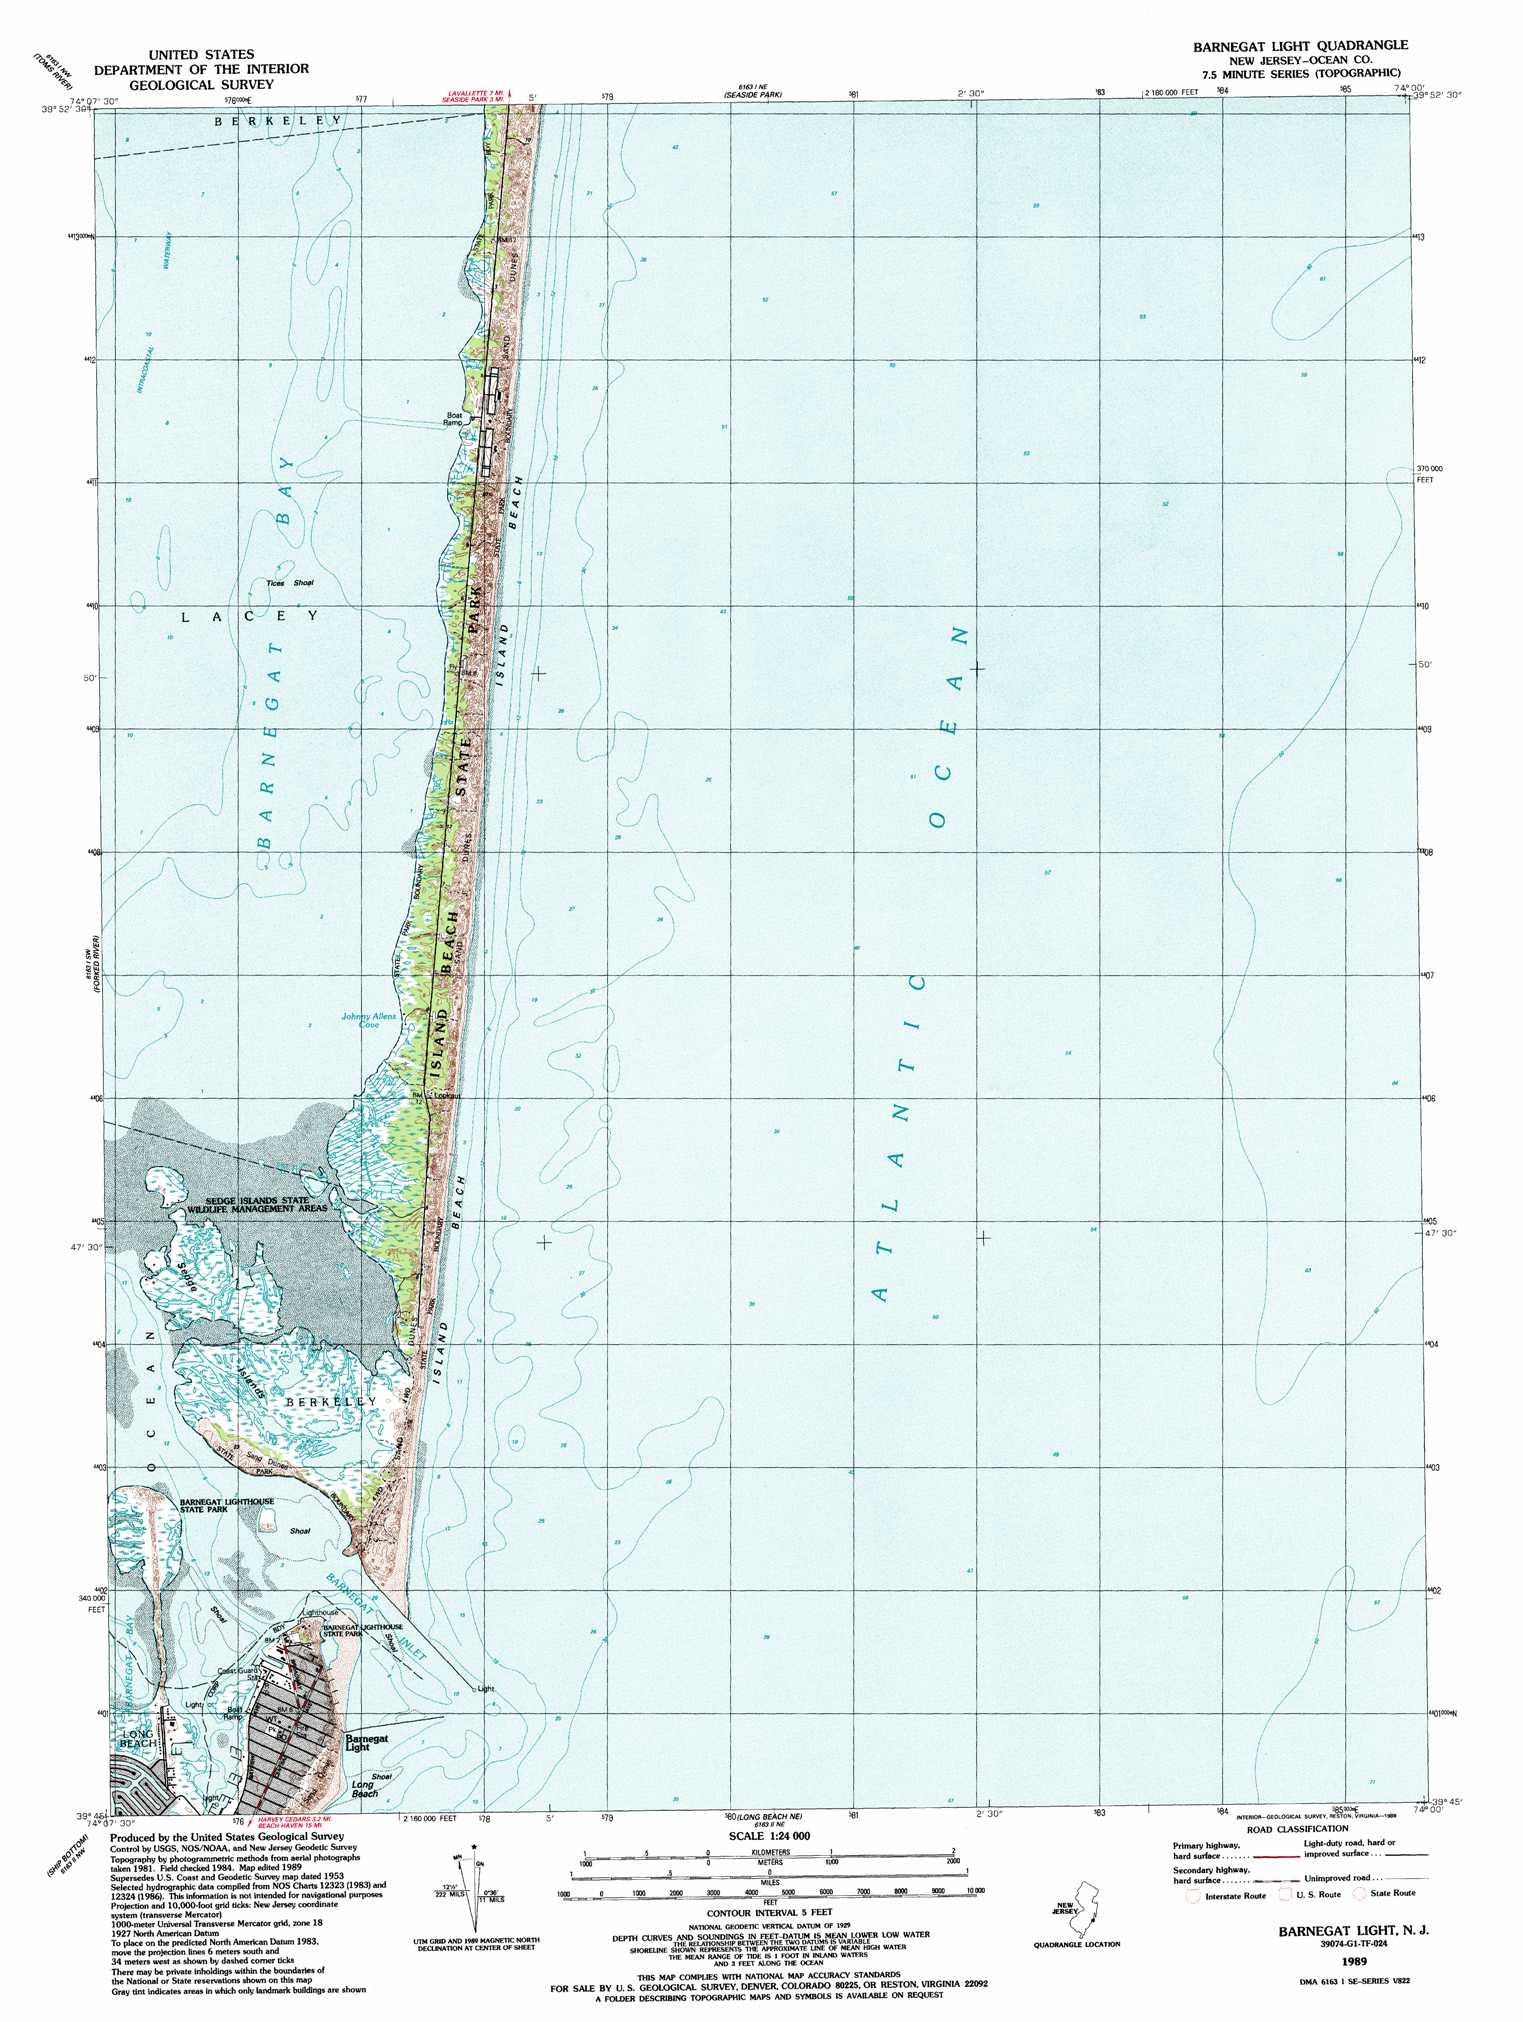 Barnegat Light topographic map NJ USGS Topo Quad g1